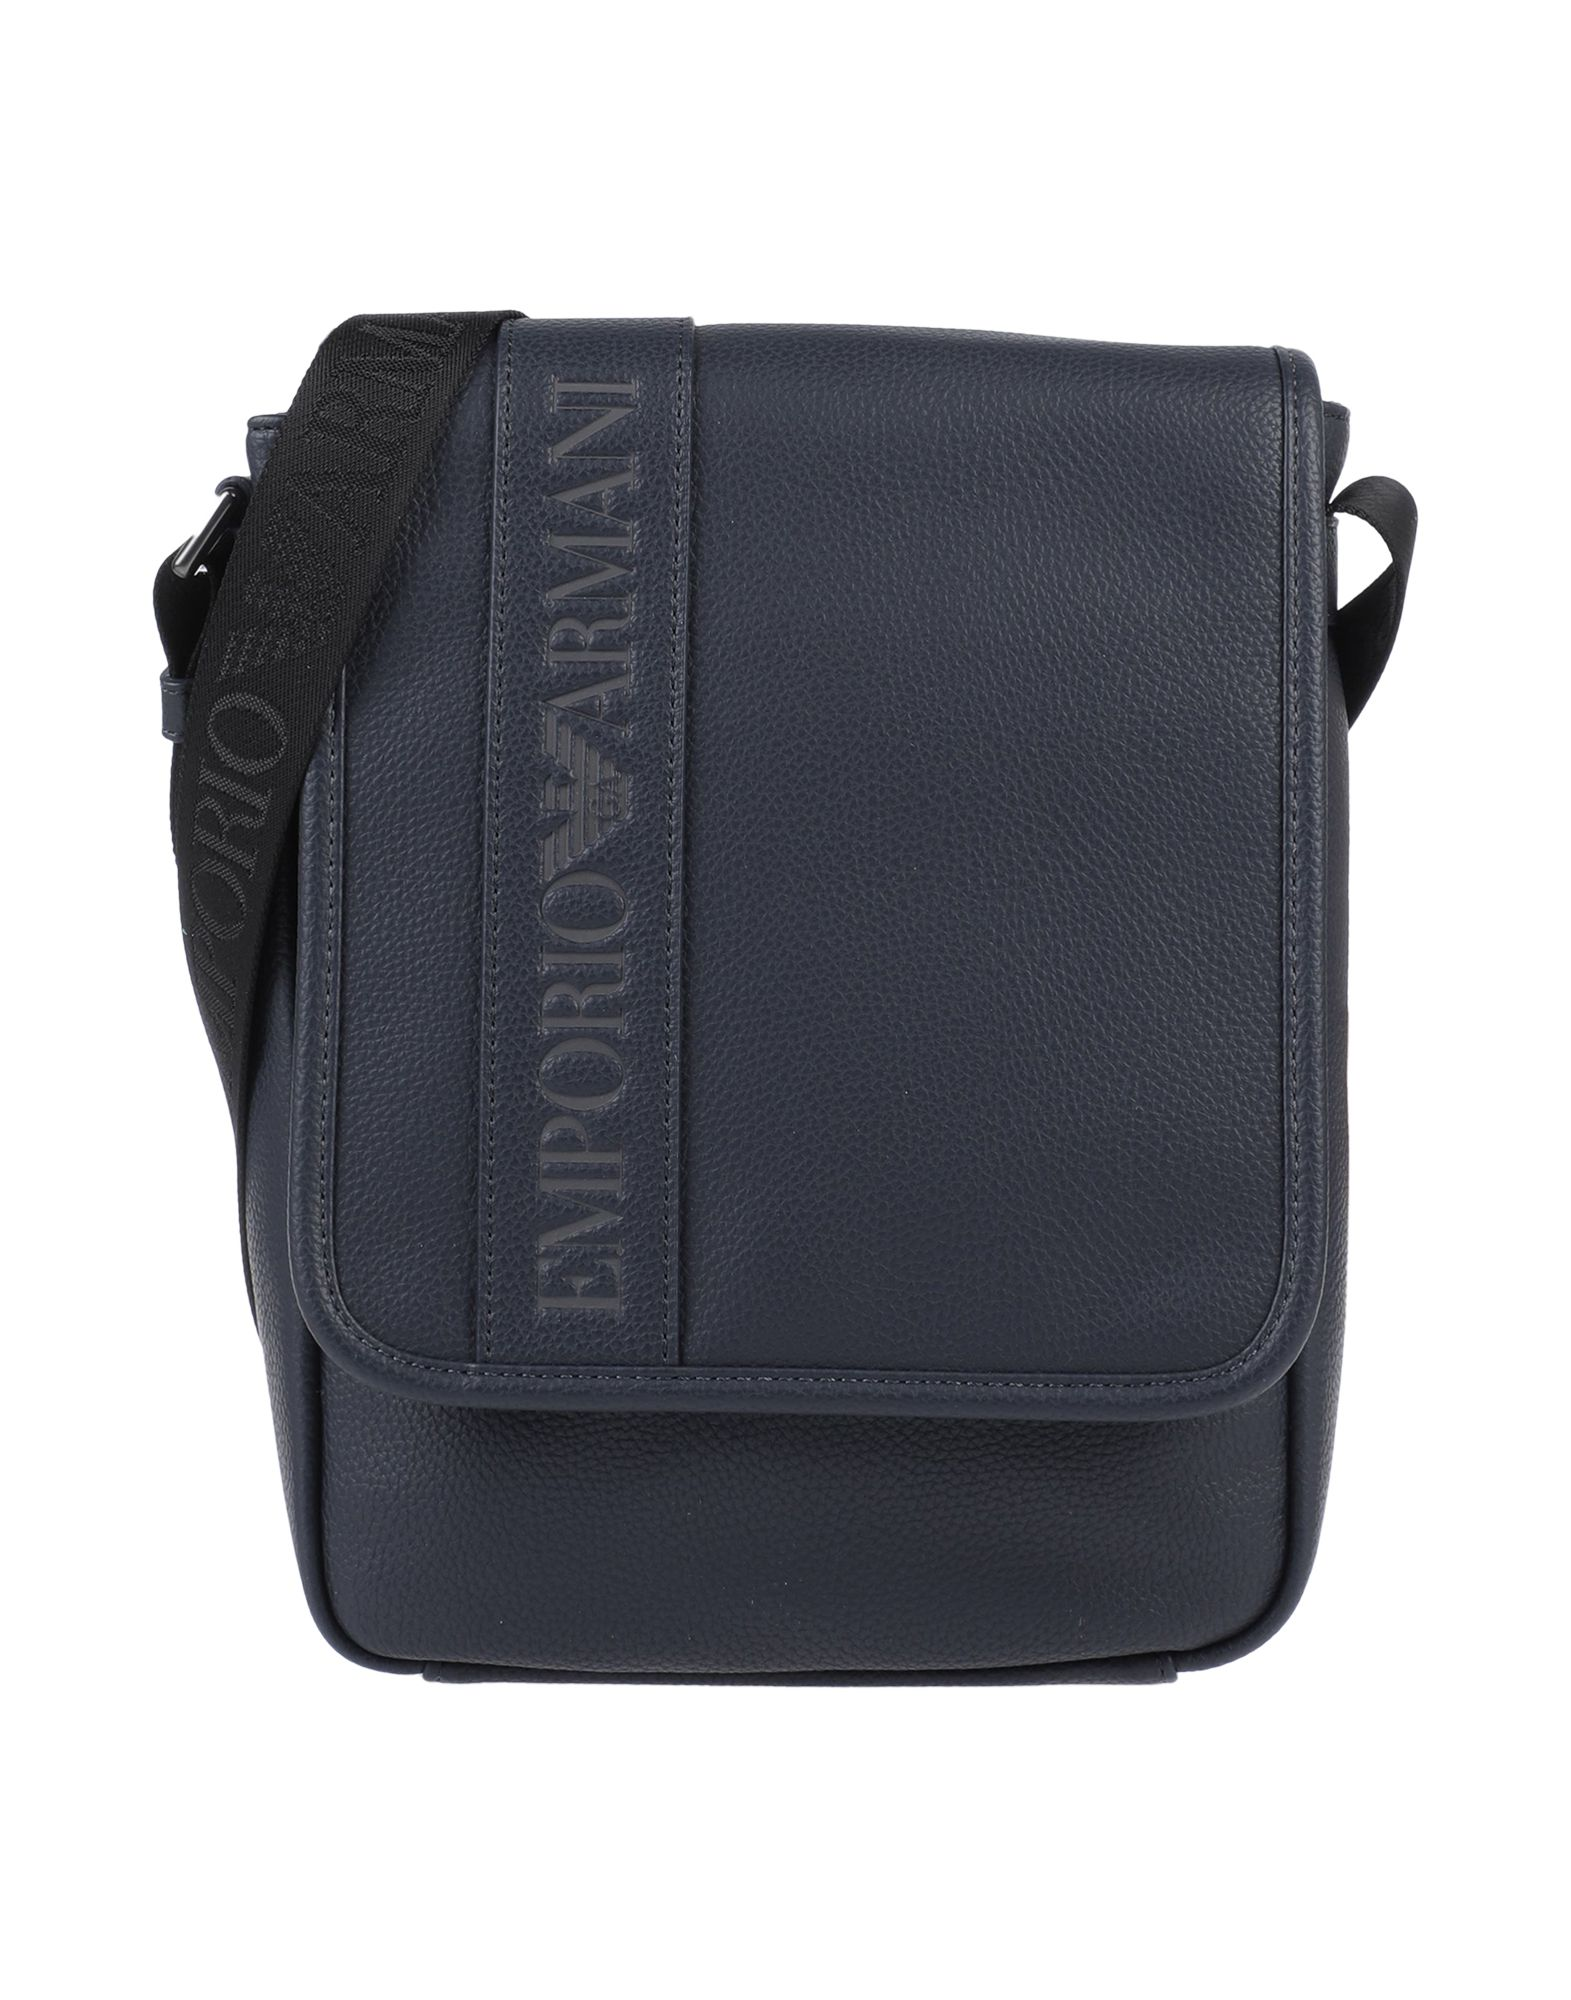 EMPORIO ARMANI Сумка через плечо сумка emporio armani сумка через плечо